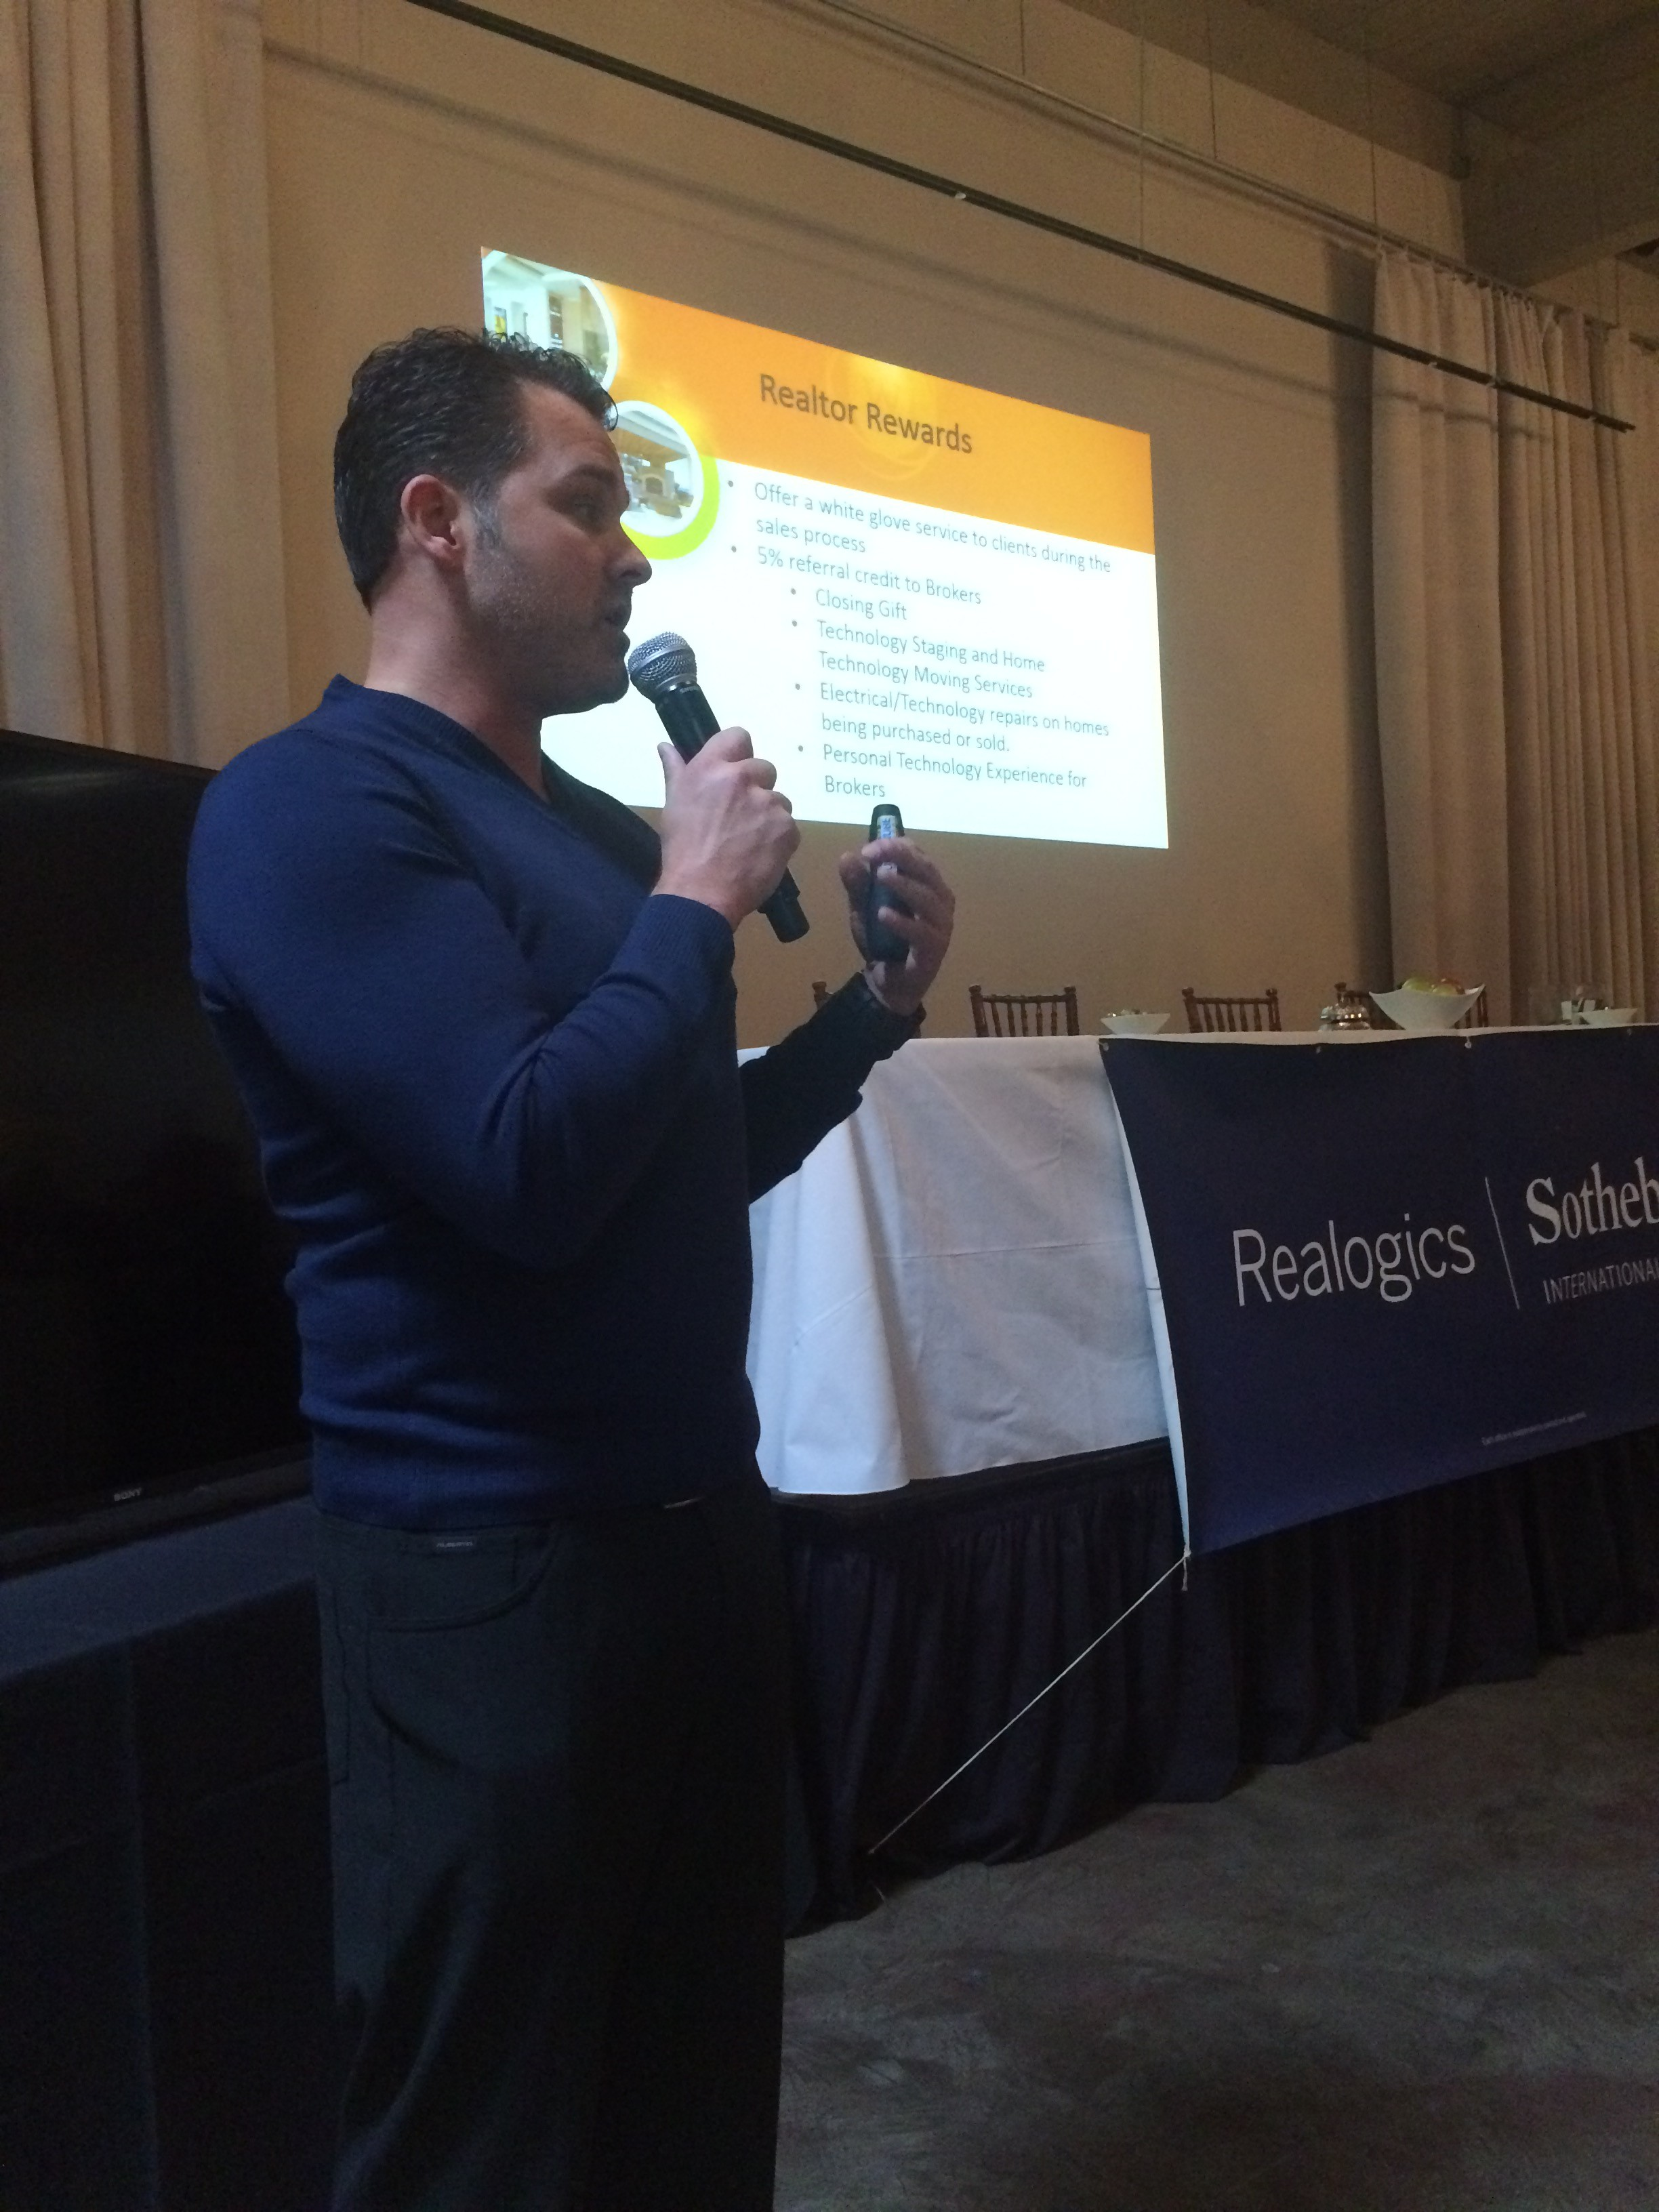 Above: Lee Travis of Wipliance Introduces the Broker Rewards Program